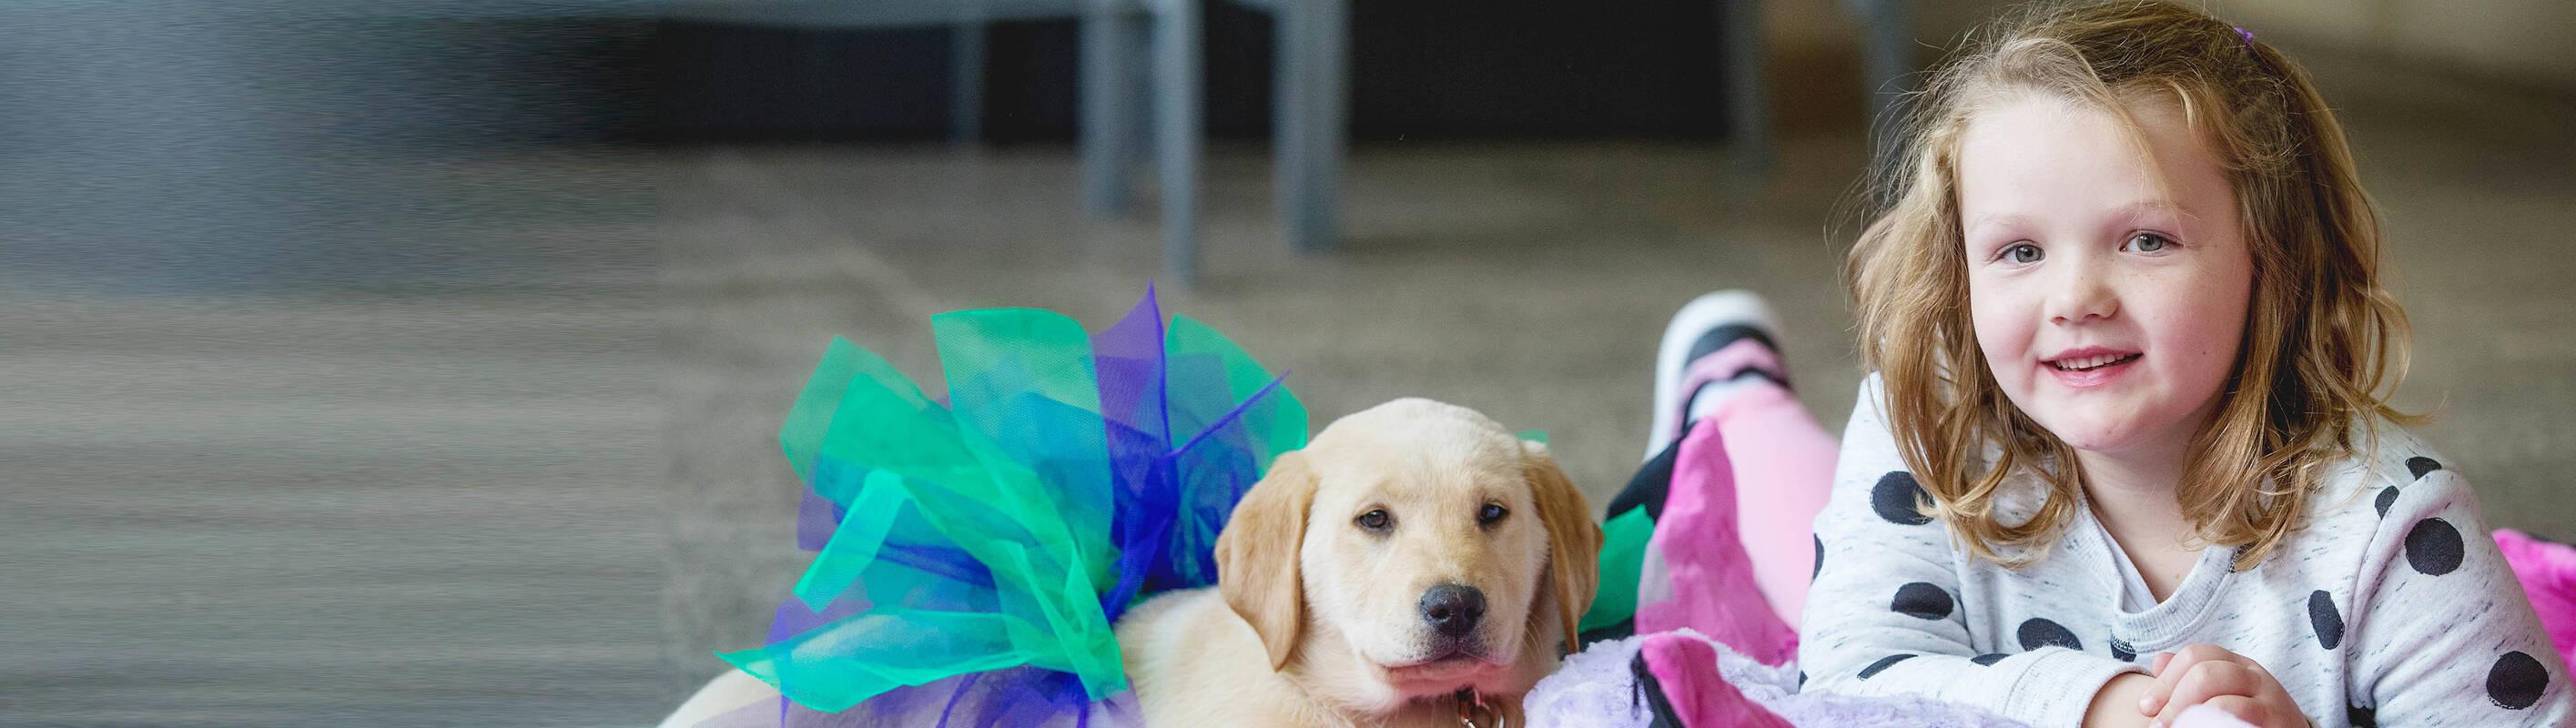 Make A Wish Australia, Children's Charity - Charli on her wish with her puppy Lola wearing a tutu